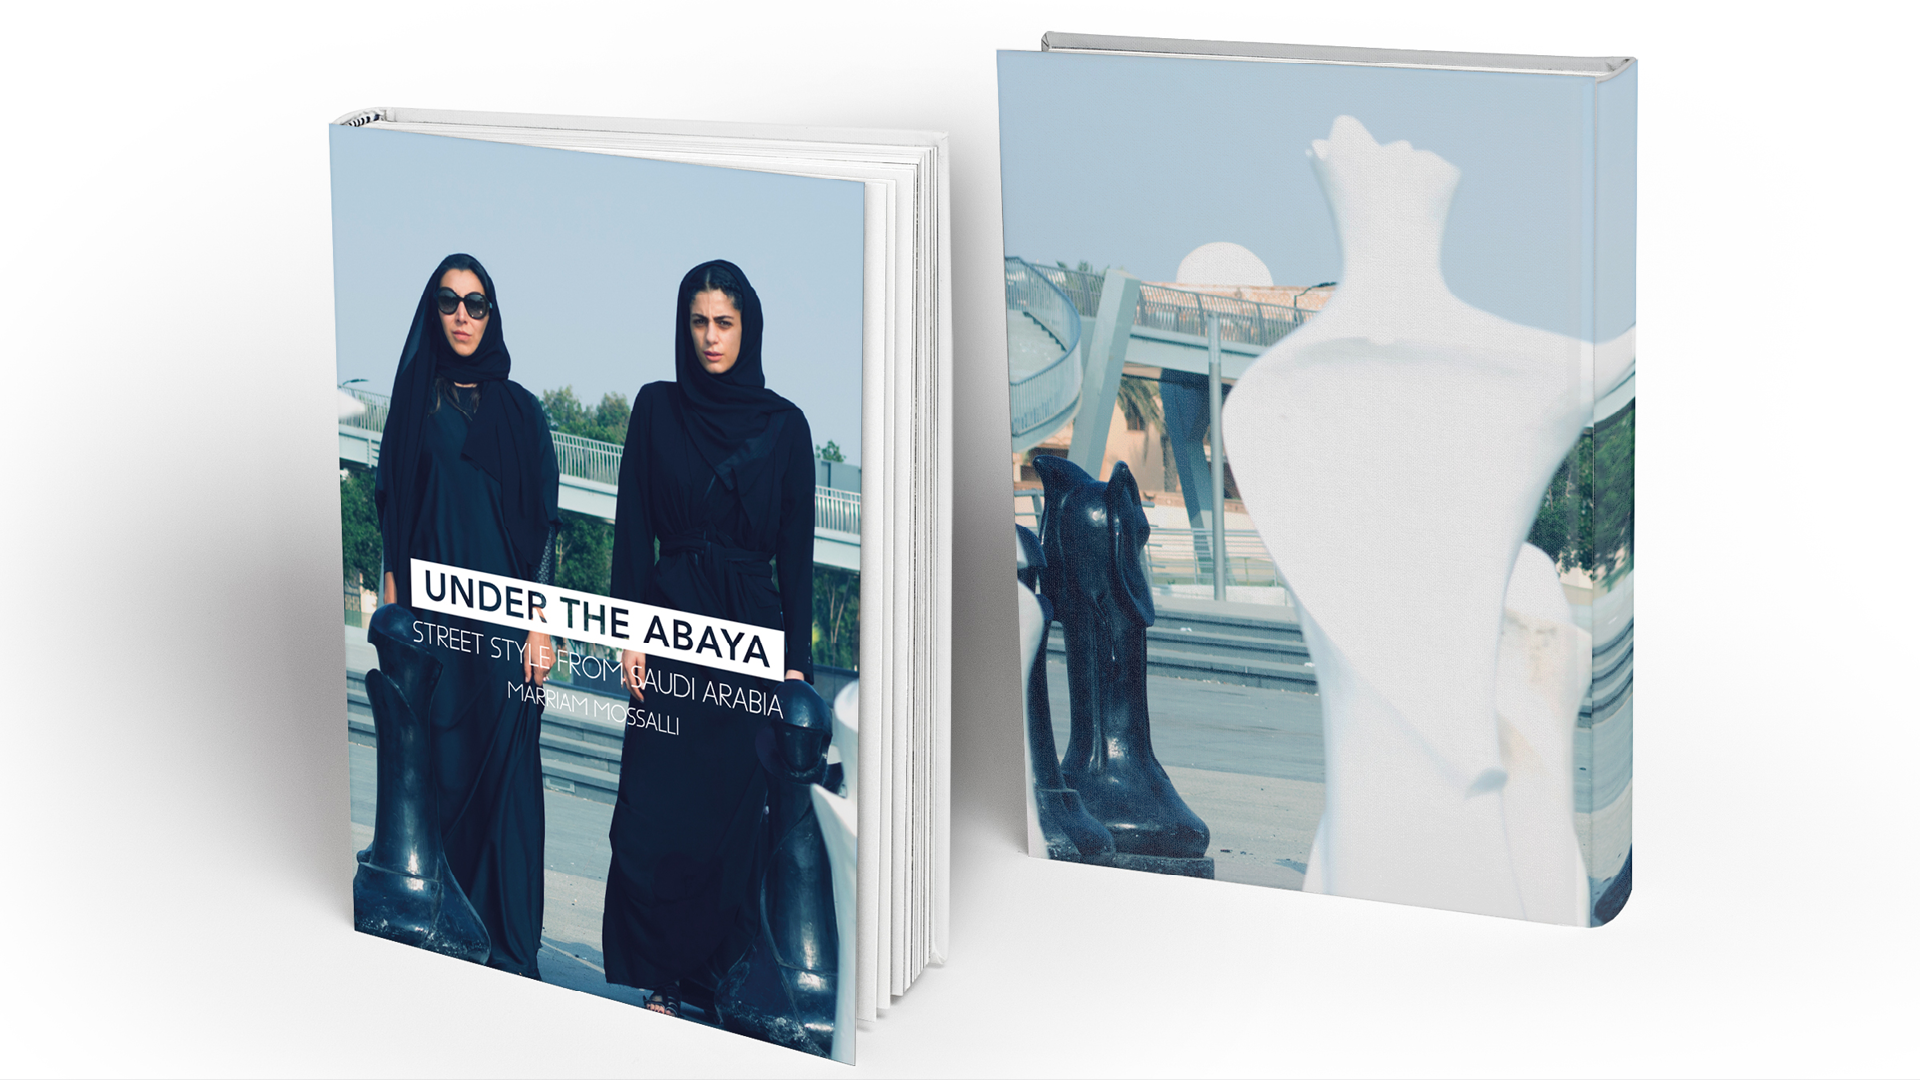 كتاب: under the abaya